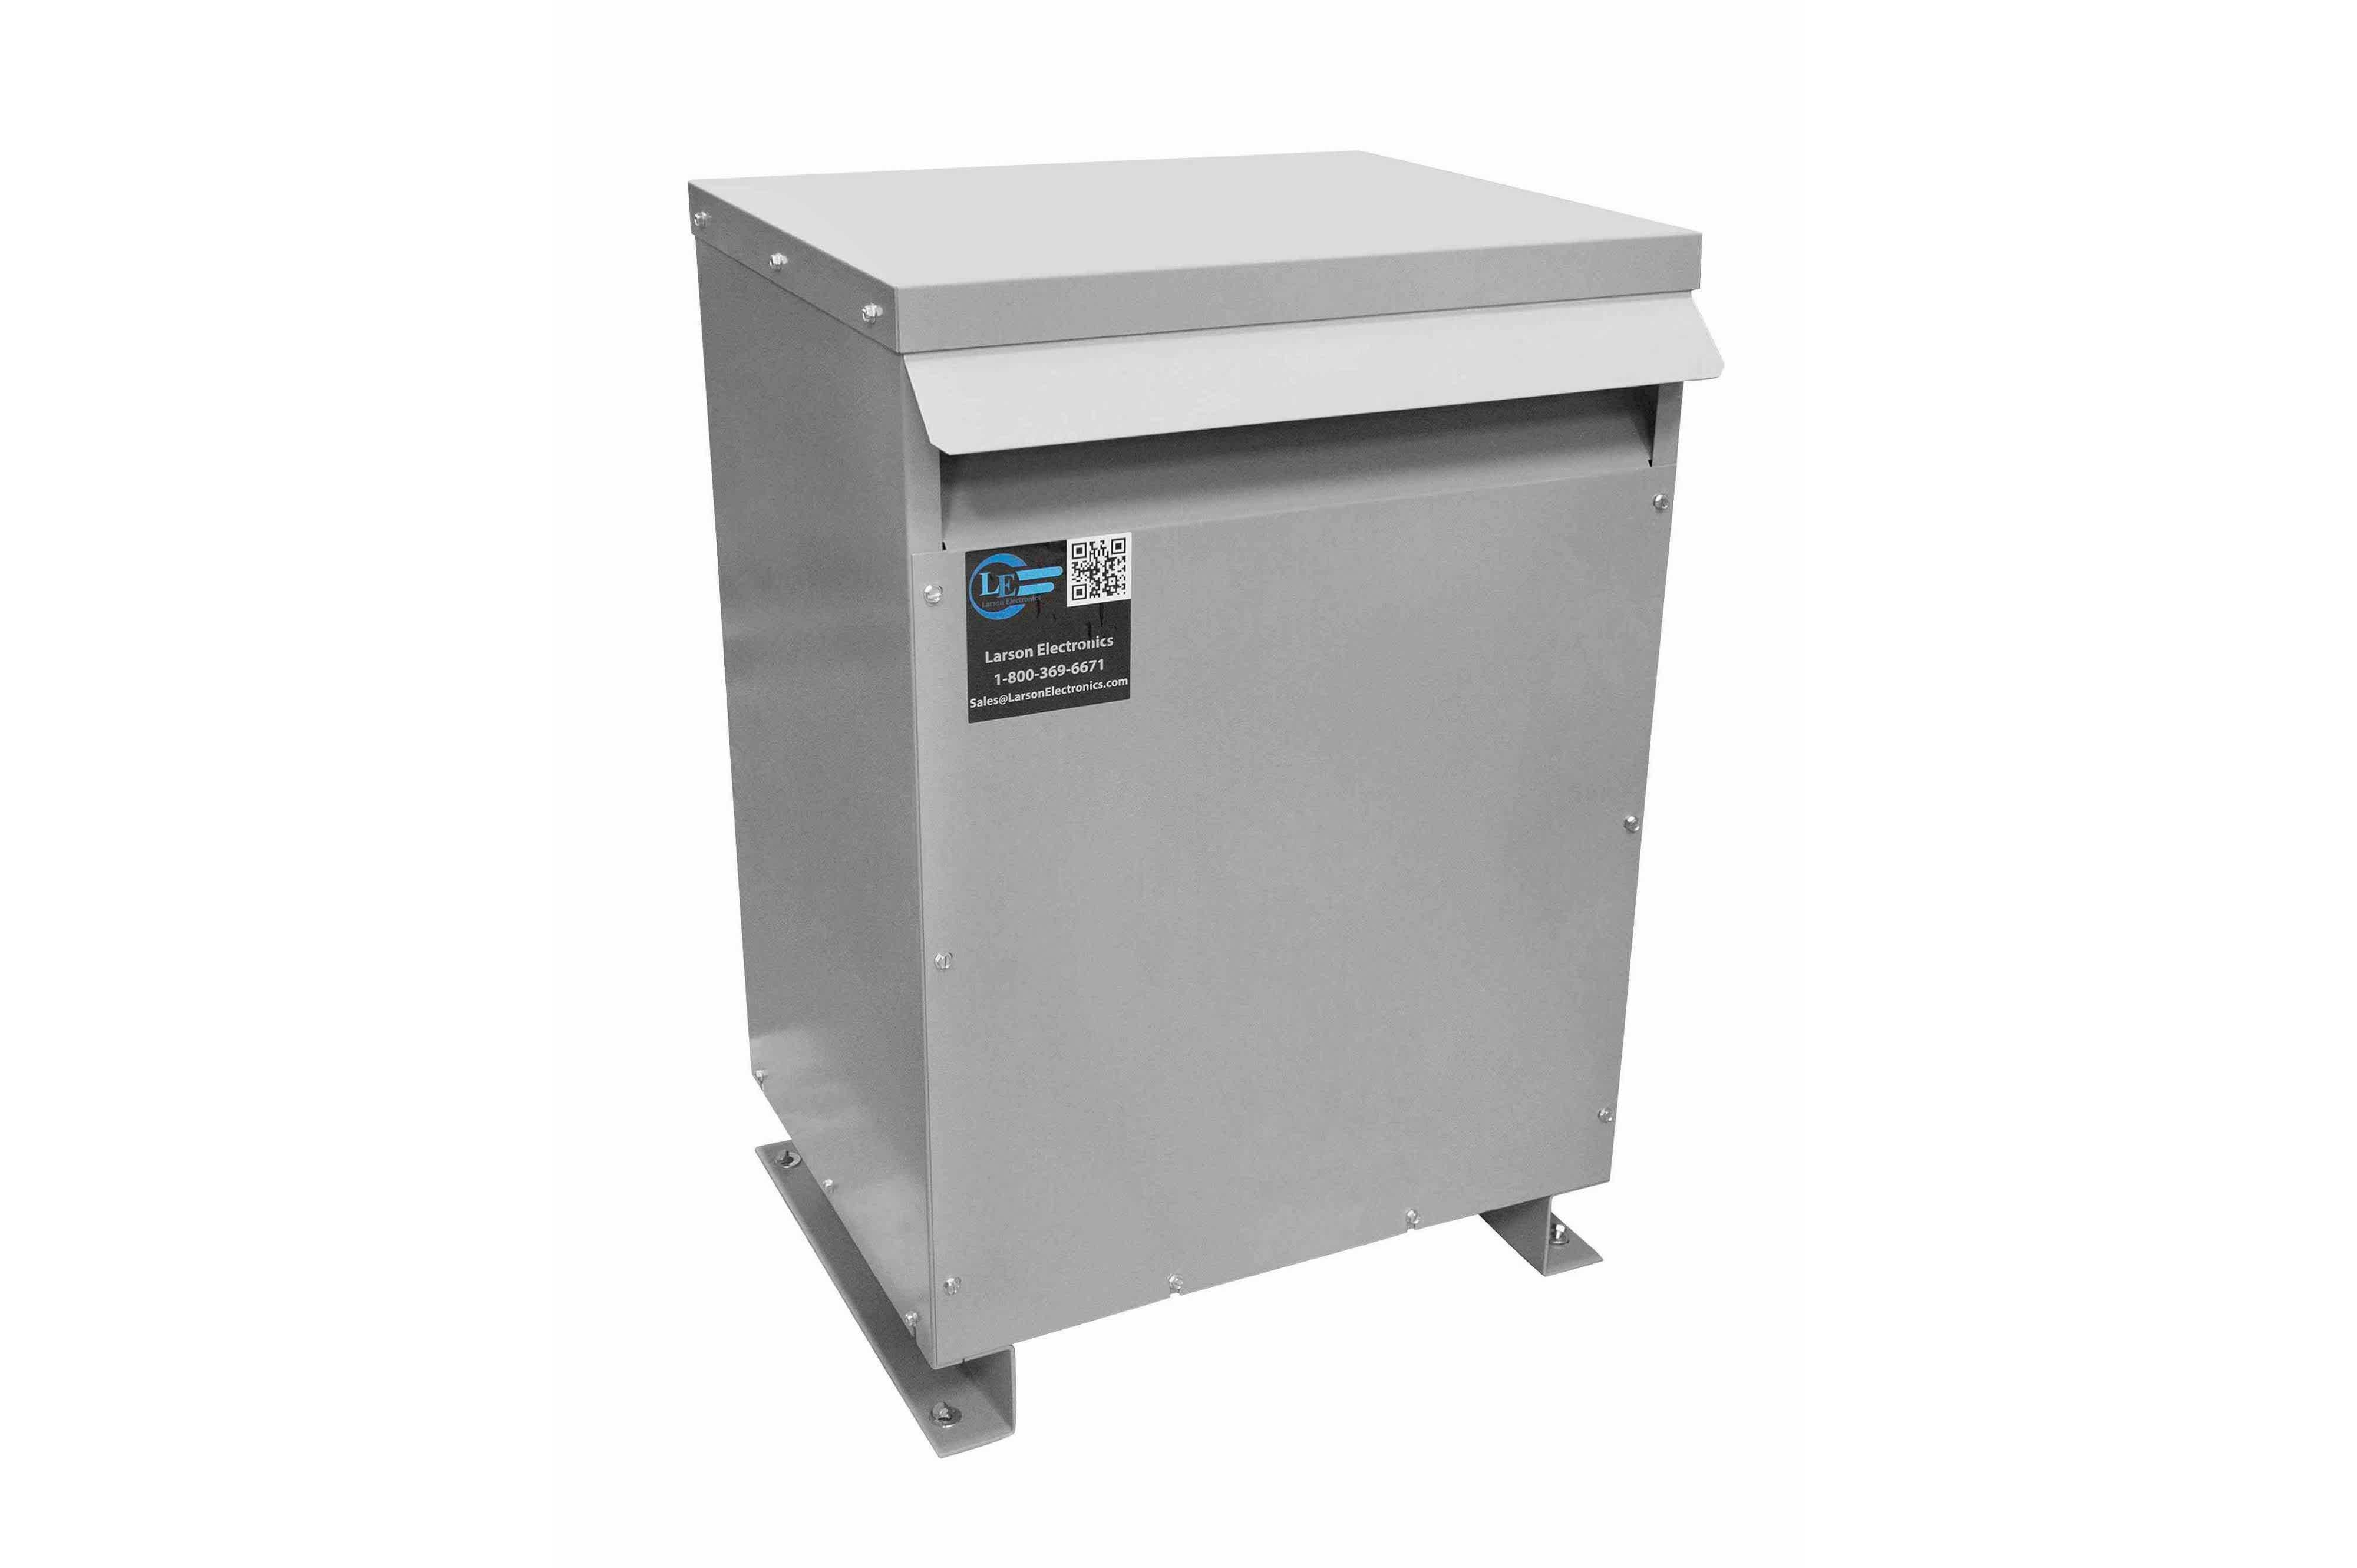 27 kVA 3PH Isolation Transformer, 380V Wye Primary, 240V Delta Secondary, N3R, Ventilated, 60 Hz